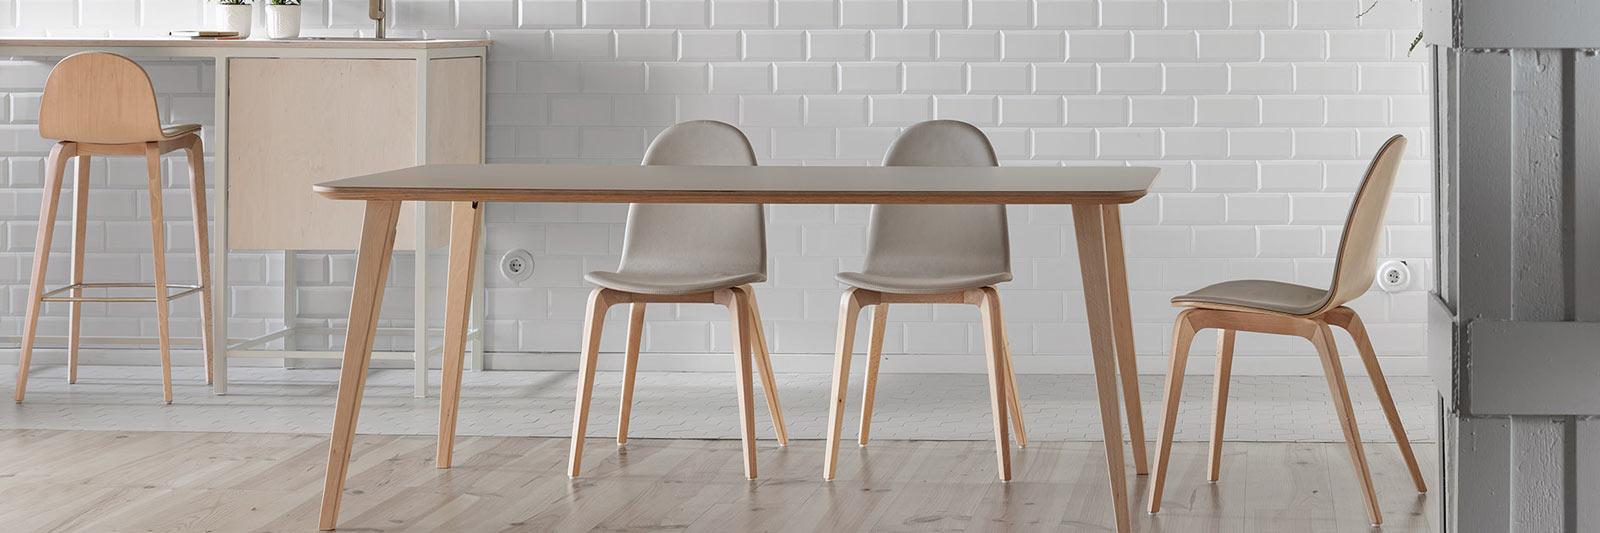 Furniture by Ondarreta